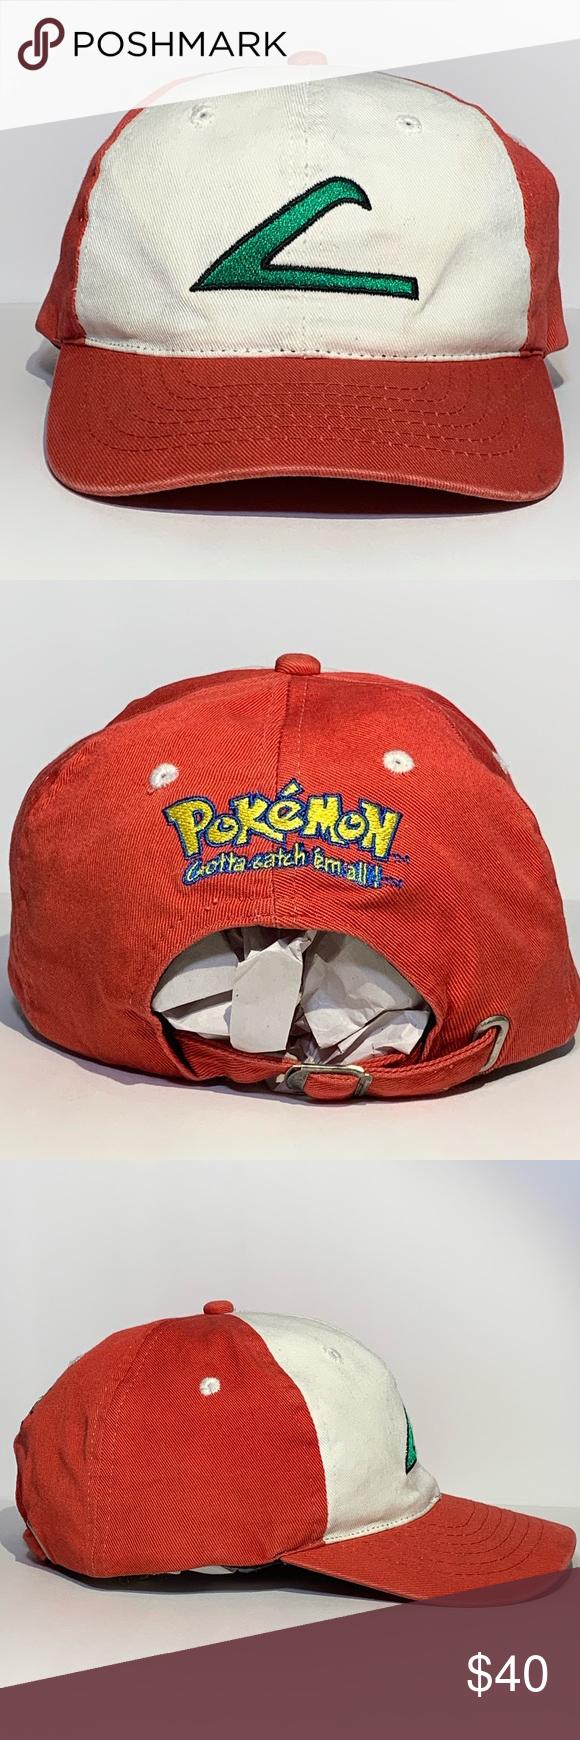 Vintage 90 S Ash Ketchum Pokemon Baseball Cap Baseball Cap Pokemon Cap